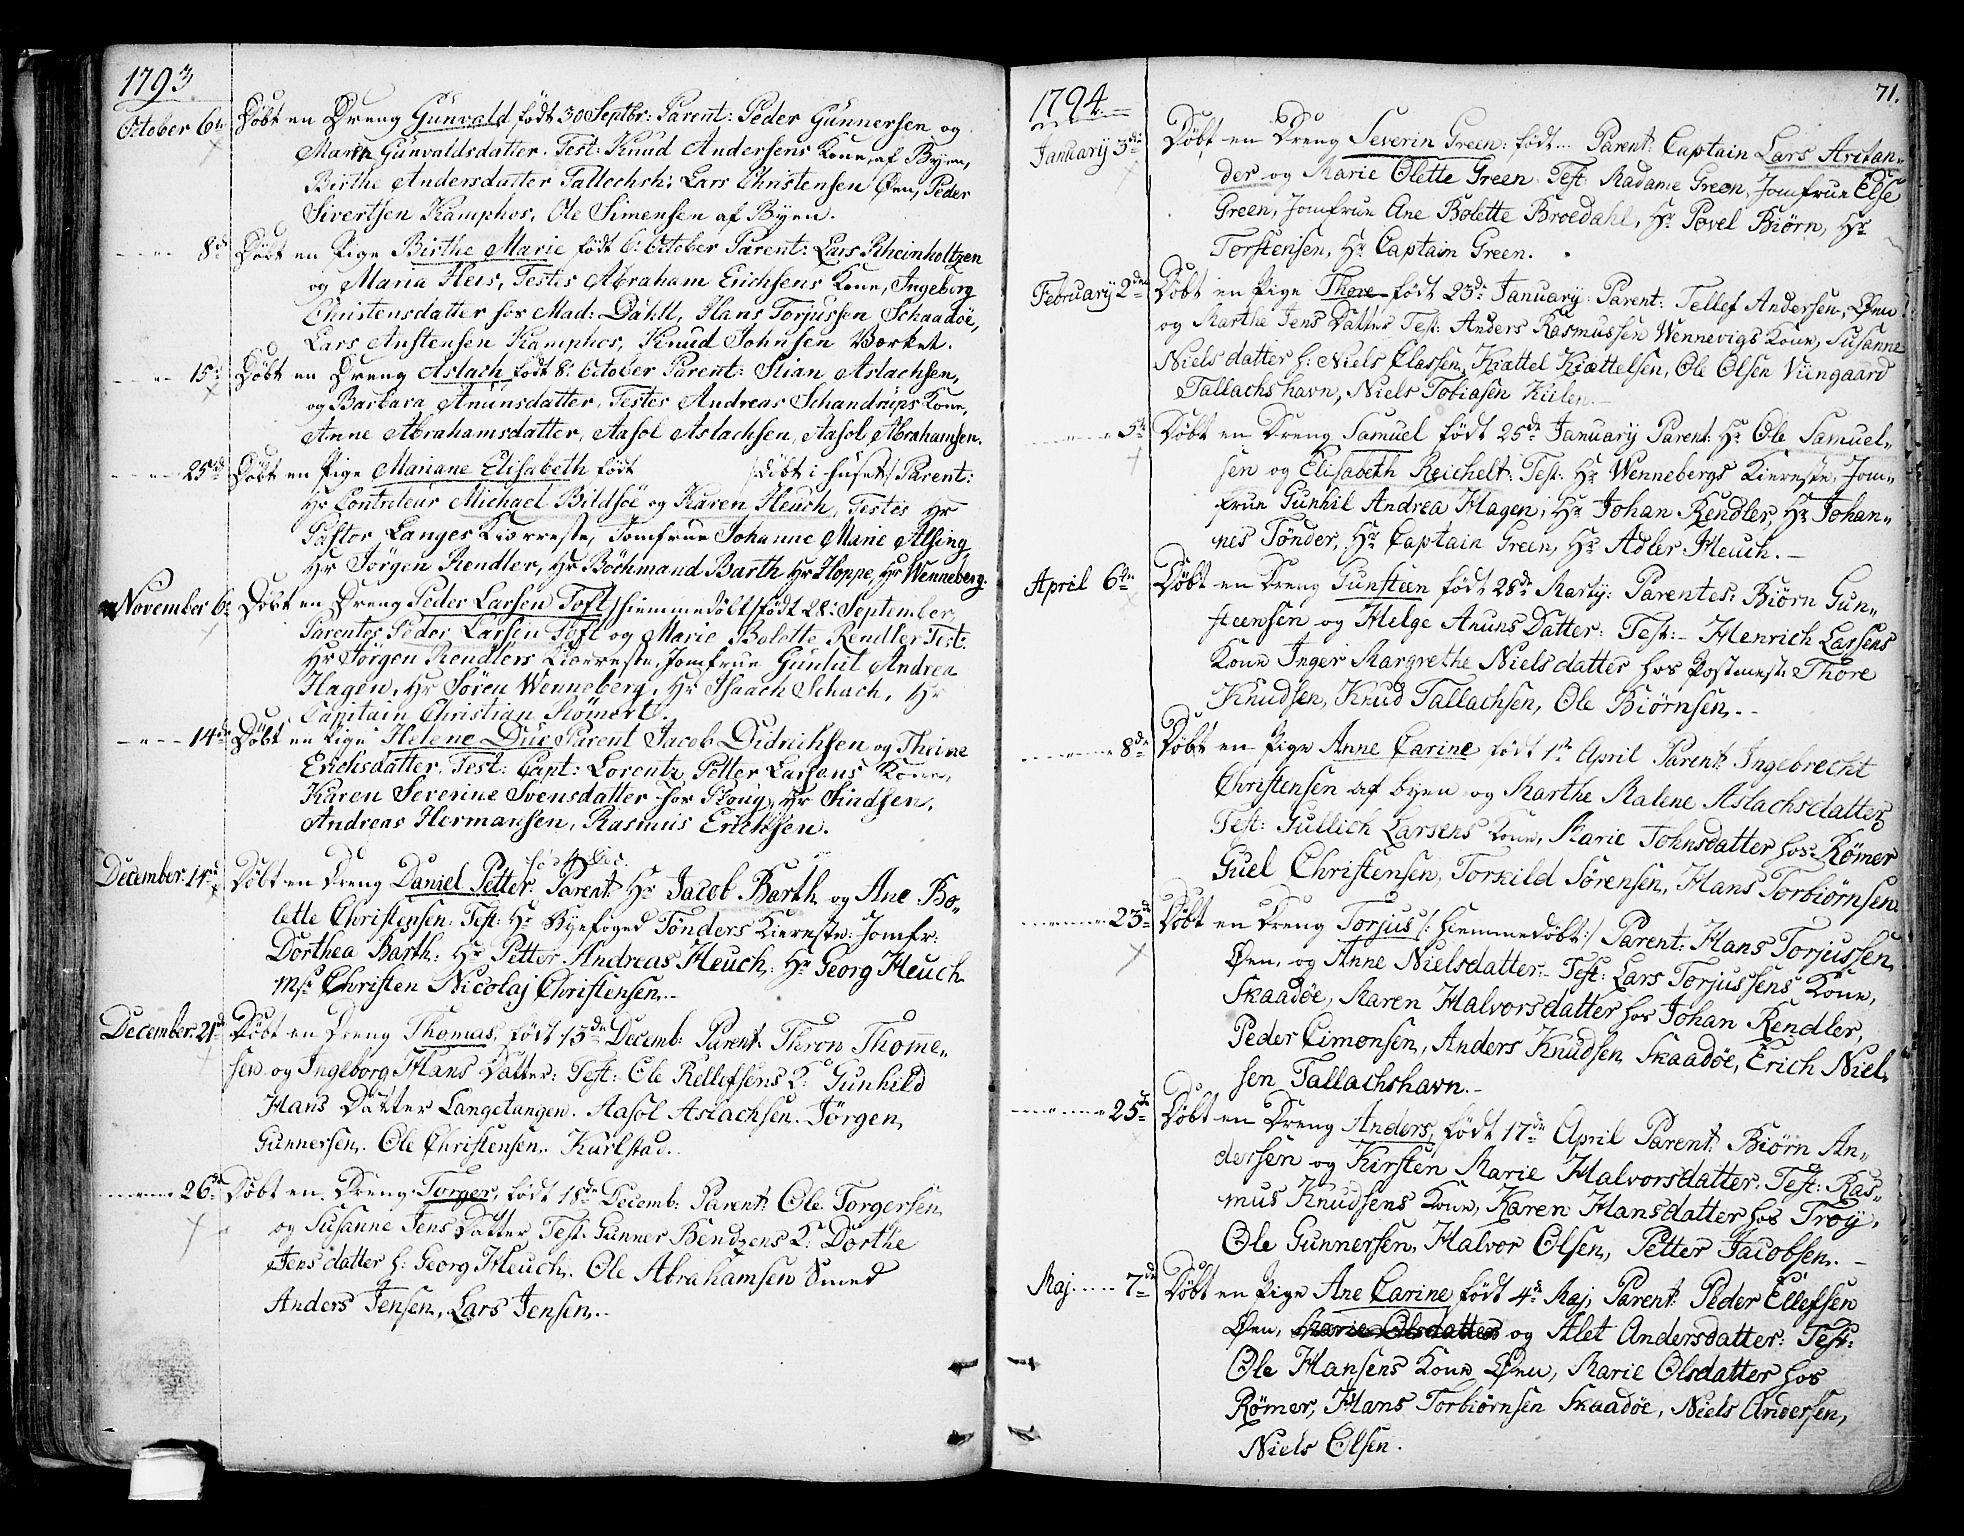 SAKO, Kragerø kirkebøker, F/Fa/L0002: Ministerialbok nr. 2, 1767-1802, s. 71